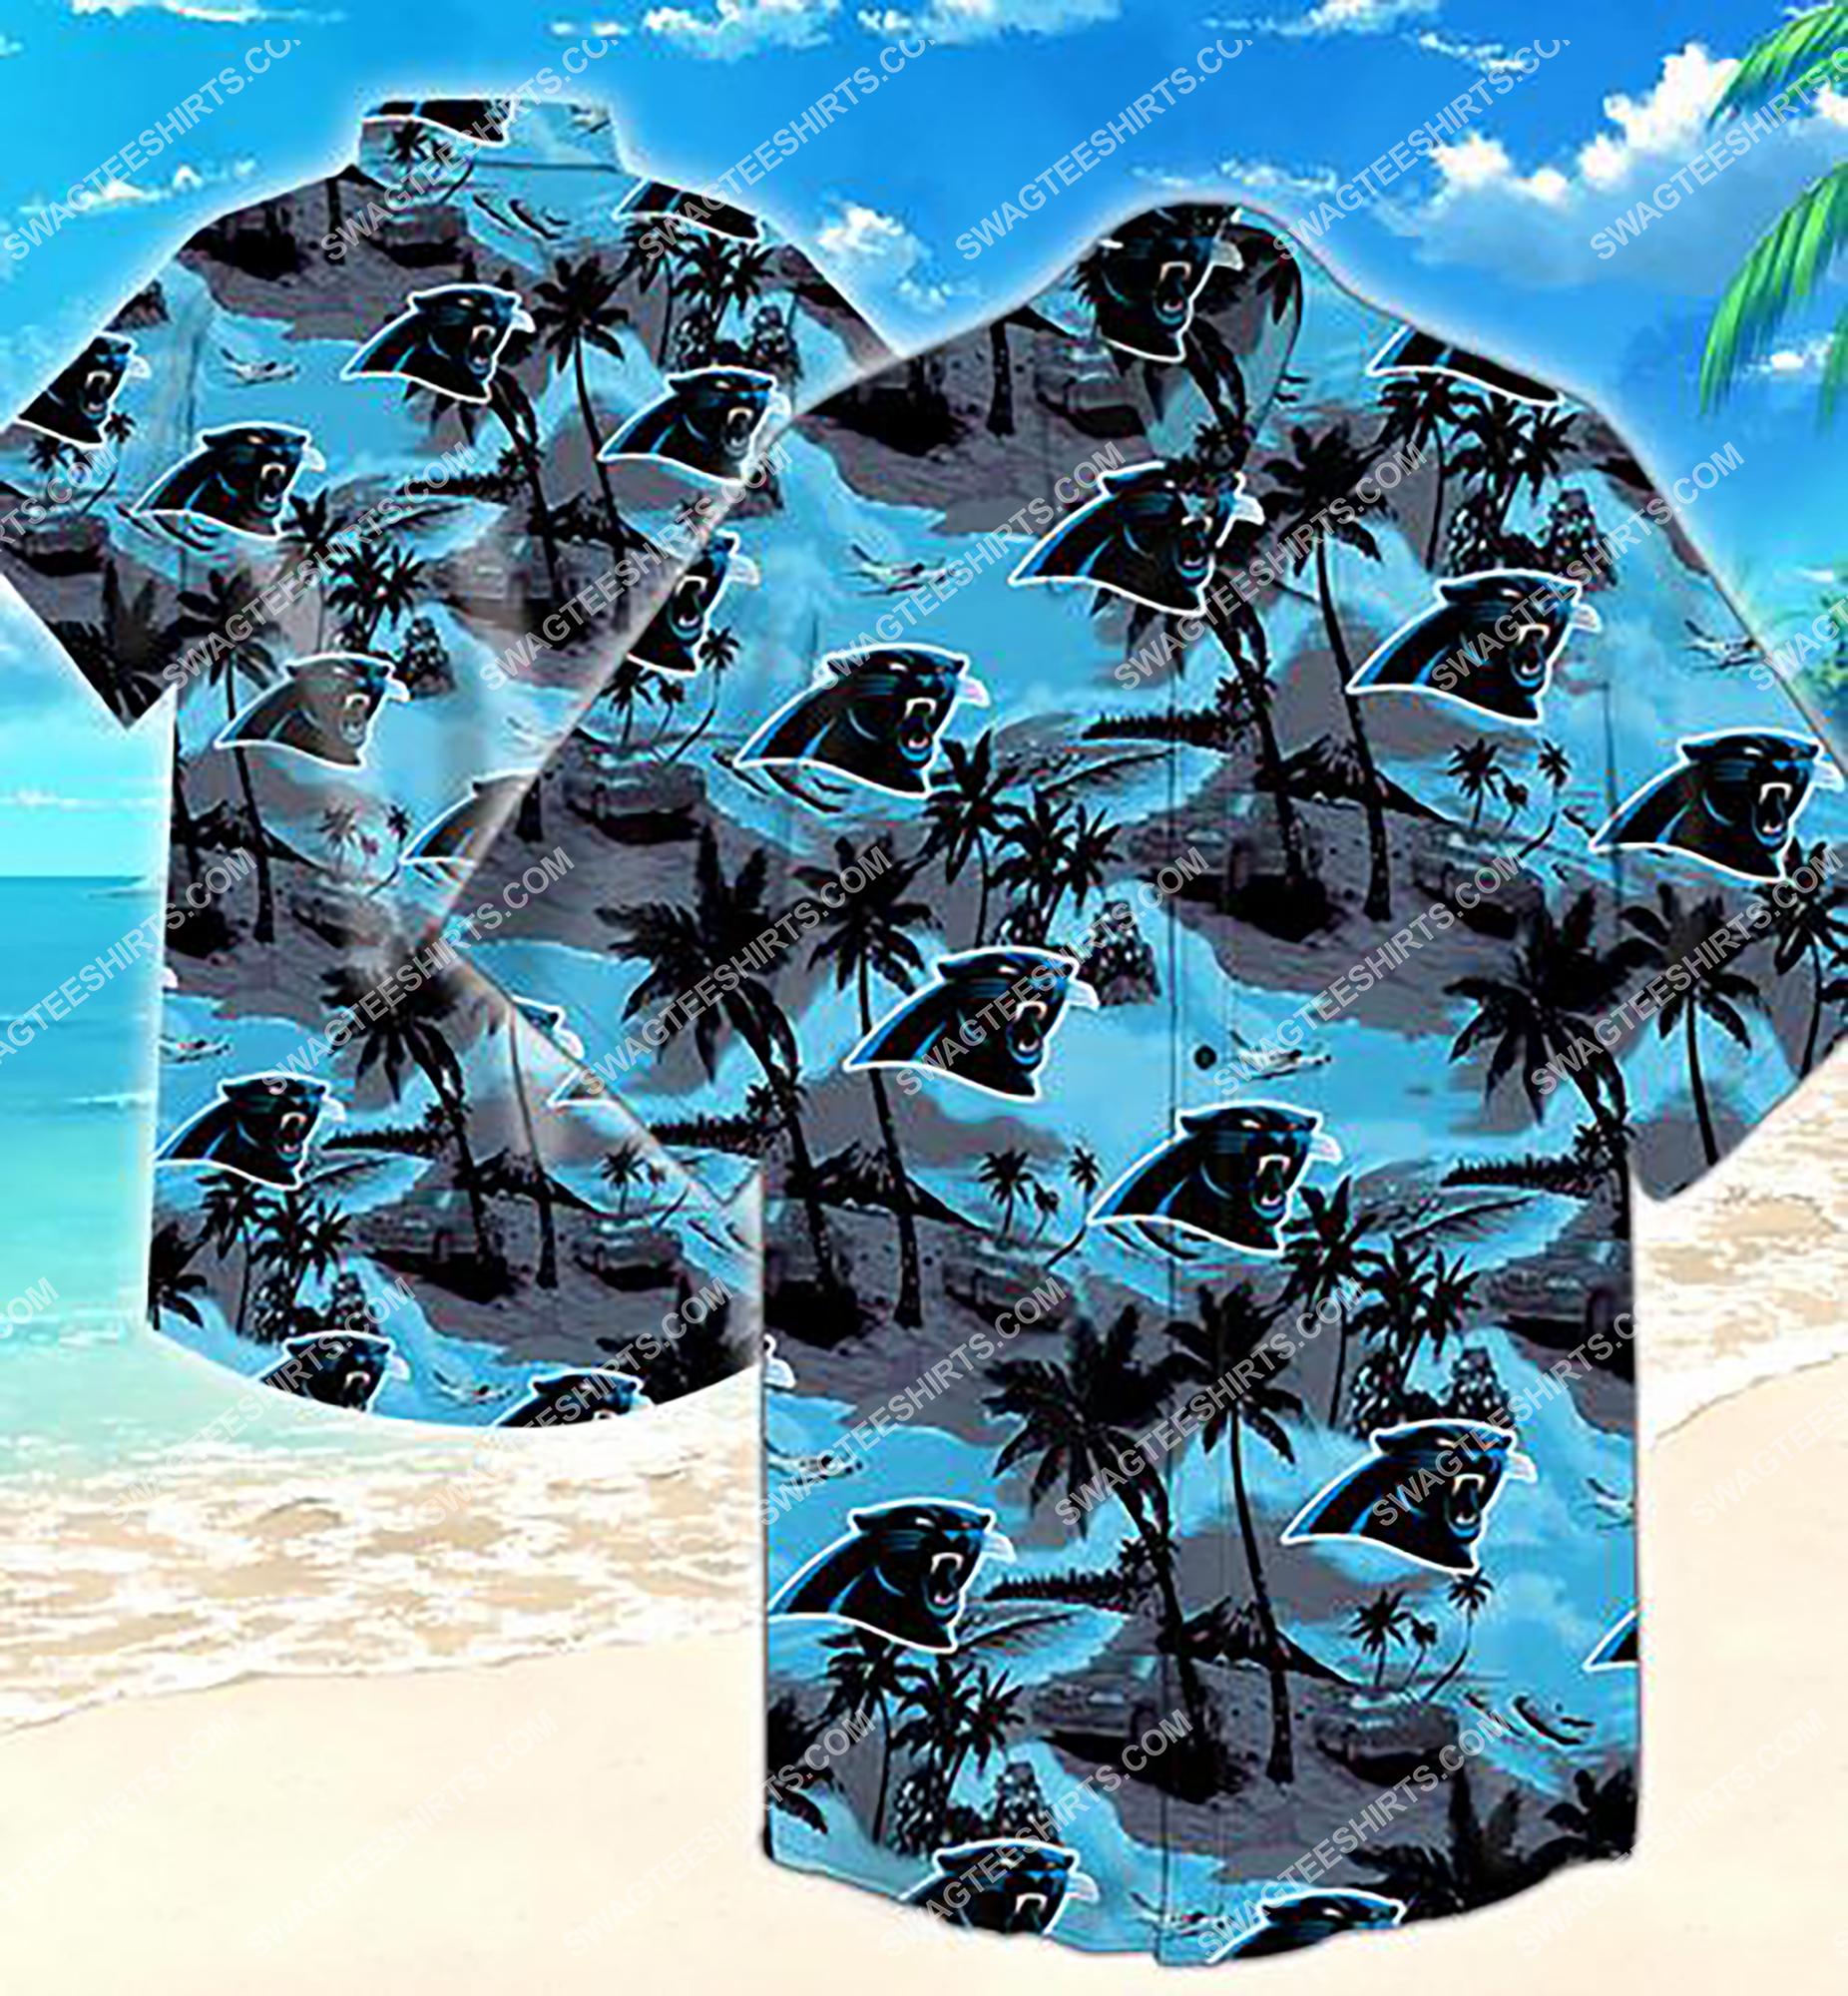 tropical flower carolina panthers team summer hawaiian shirt 2 - Copy